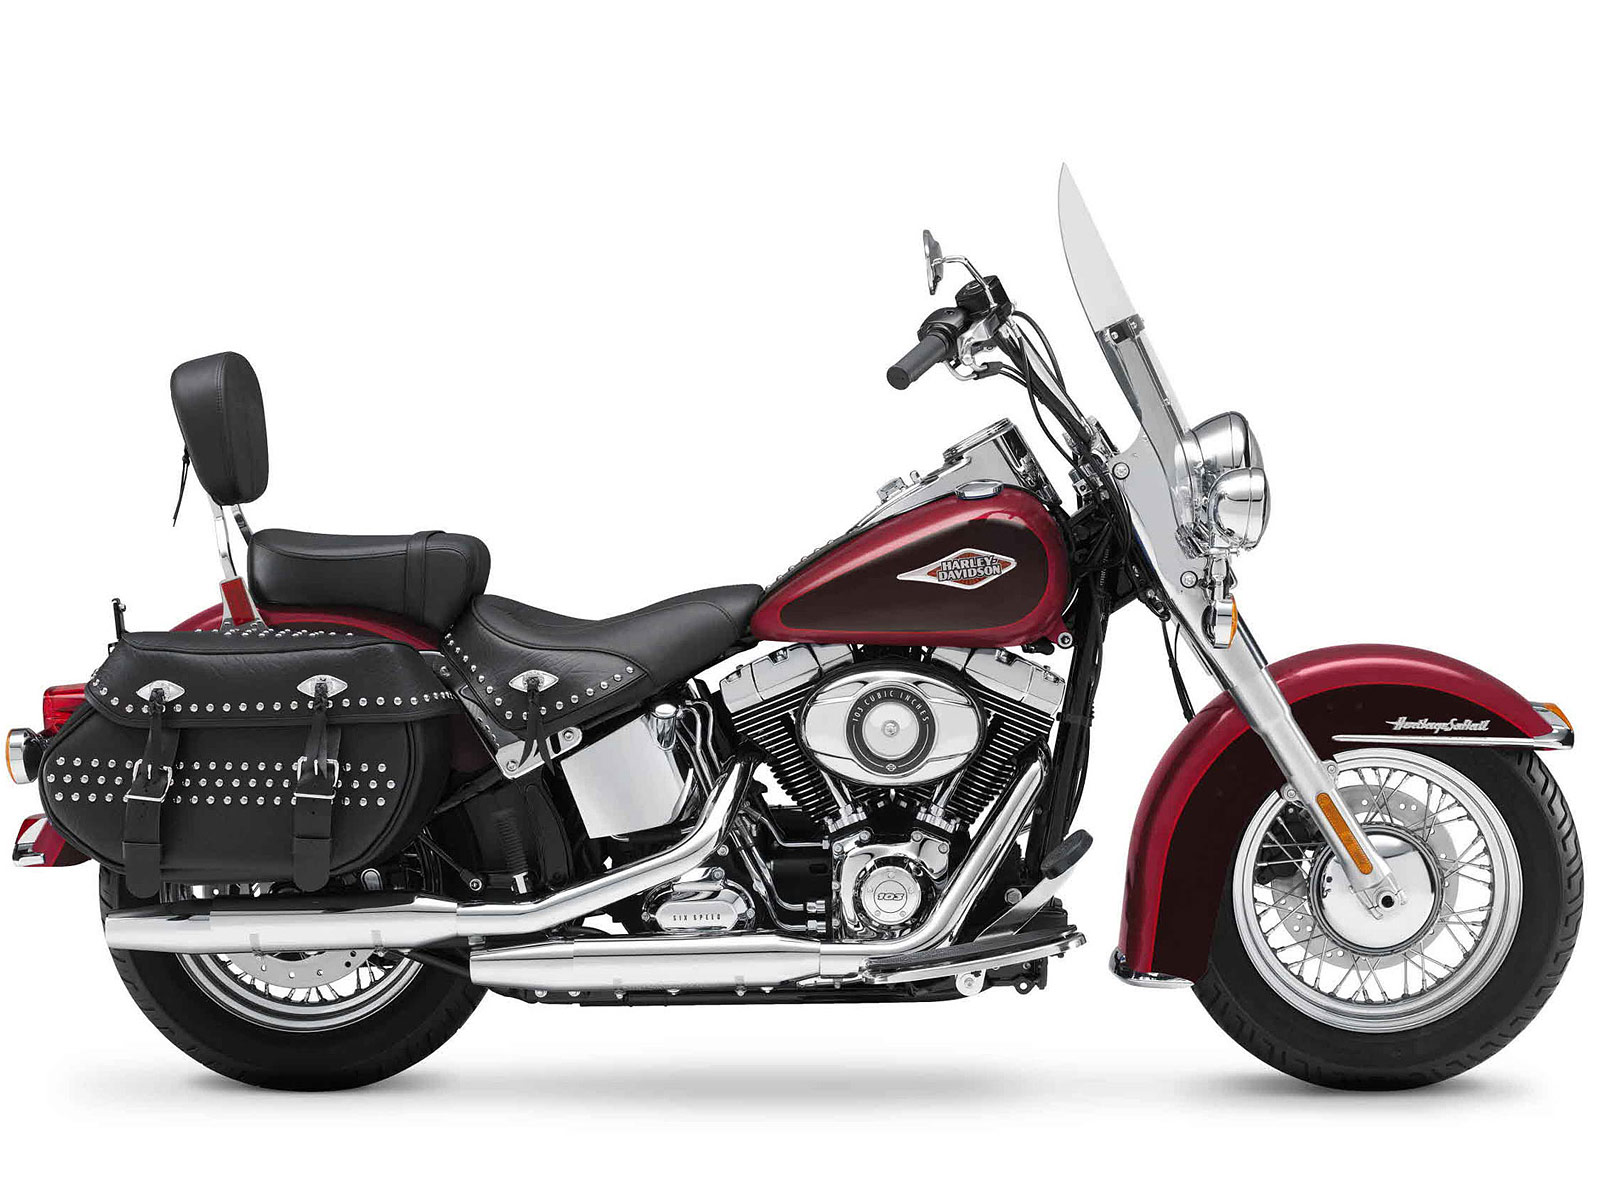 Harley Davidson 2012: 2012 FLSTC Heritage Softail Classic Harley-Davidson Pictures